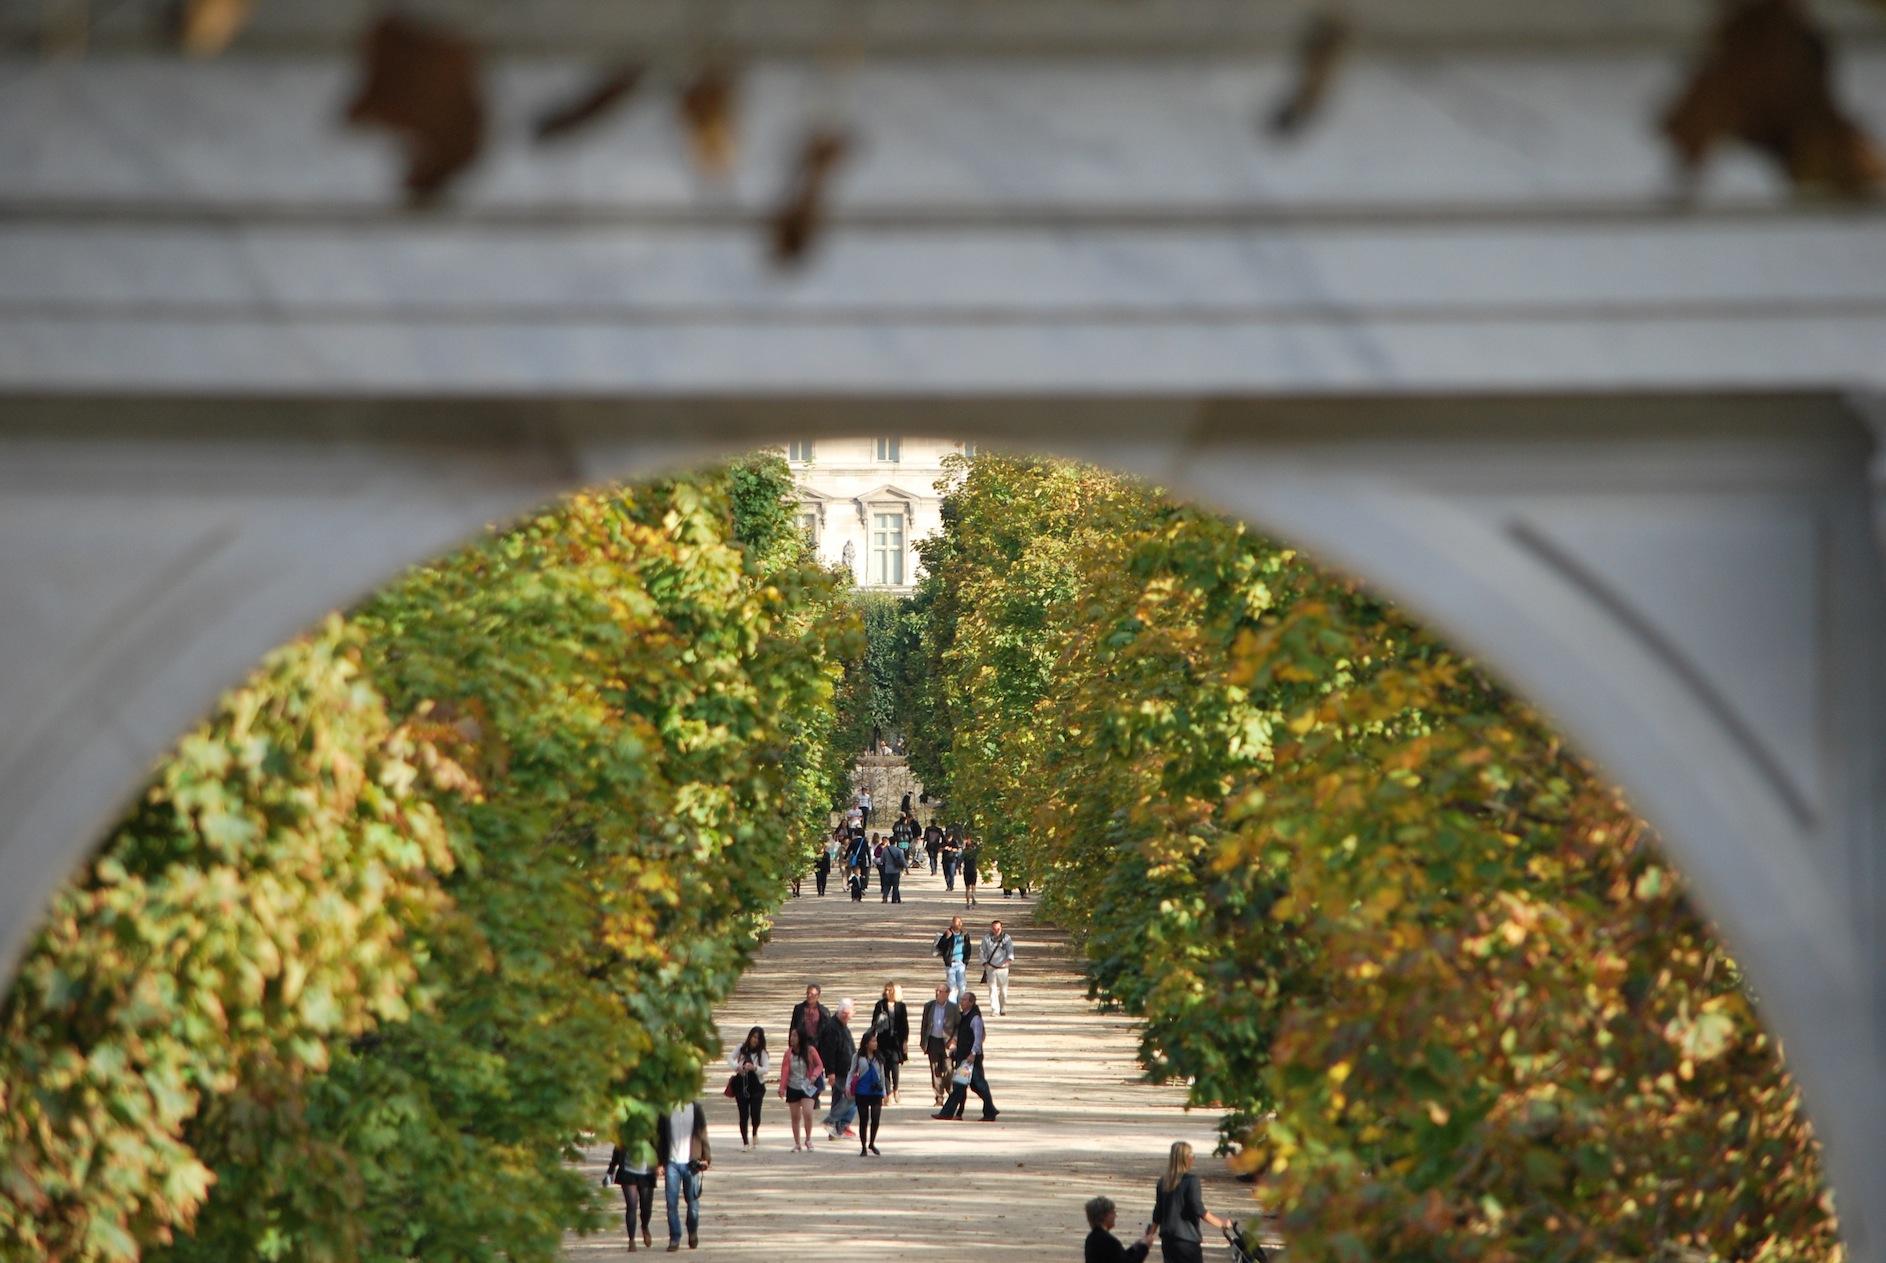 Overhang jardin des tuileries this wandering life for Jardin jardin tuileries